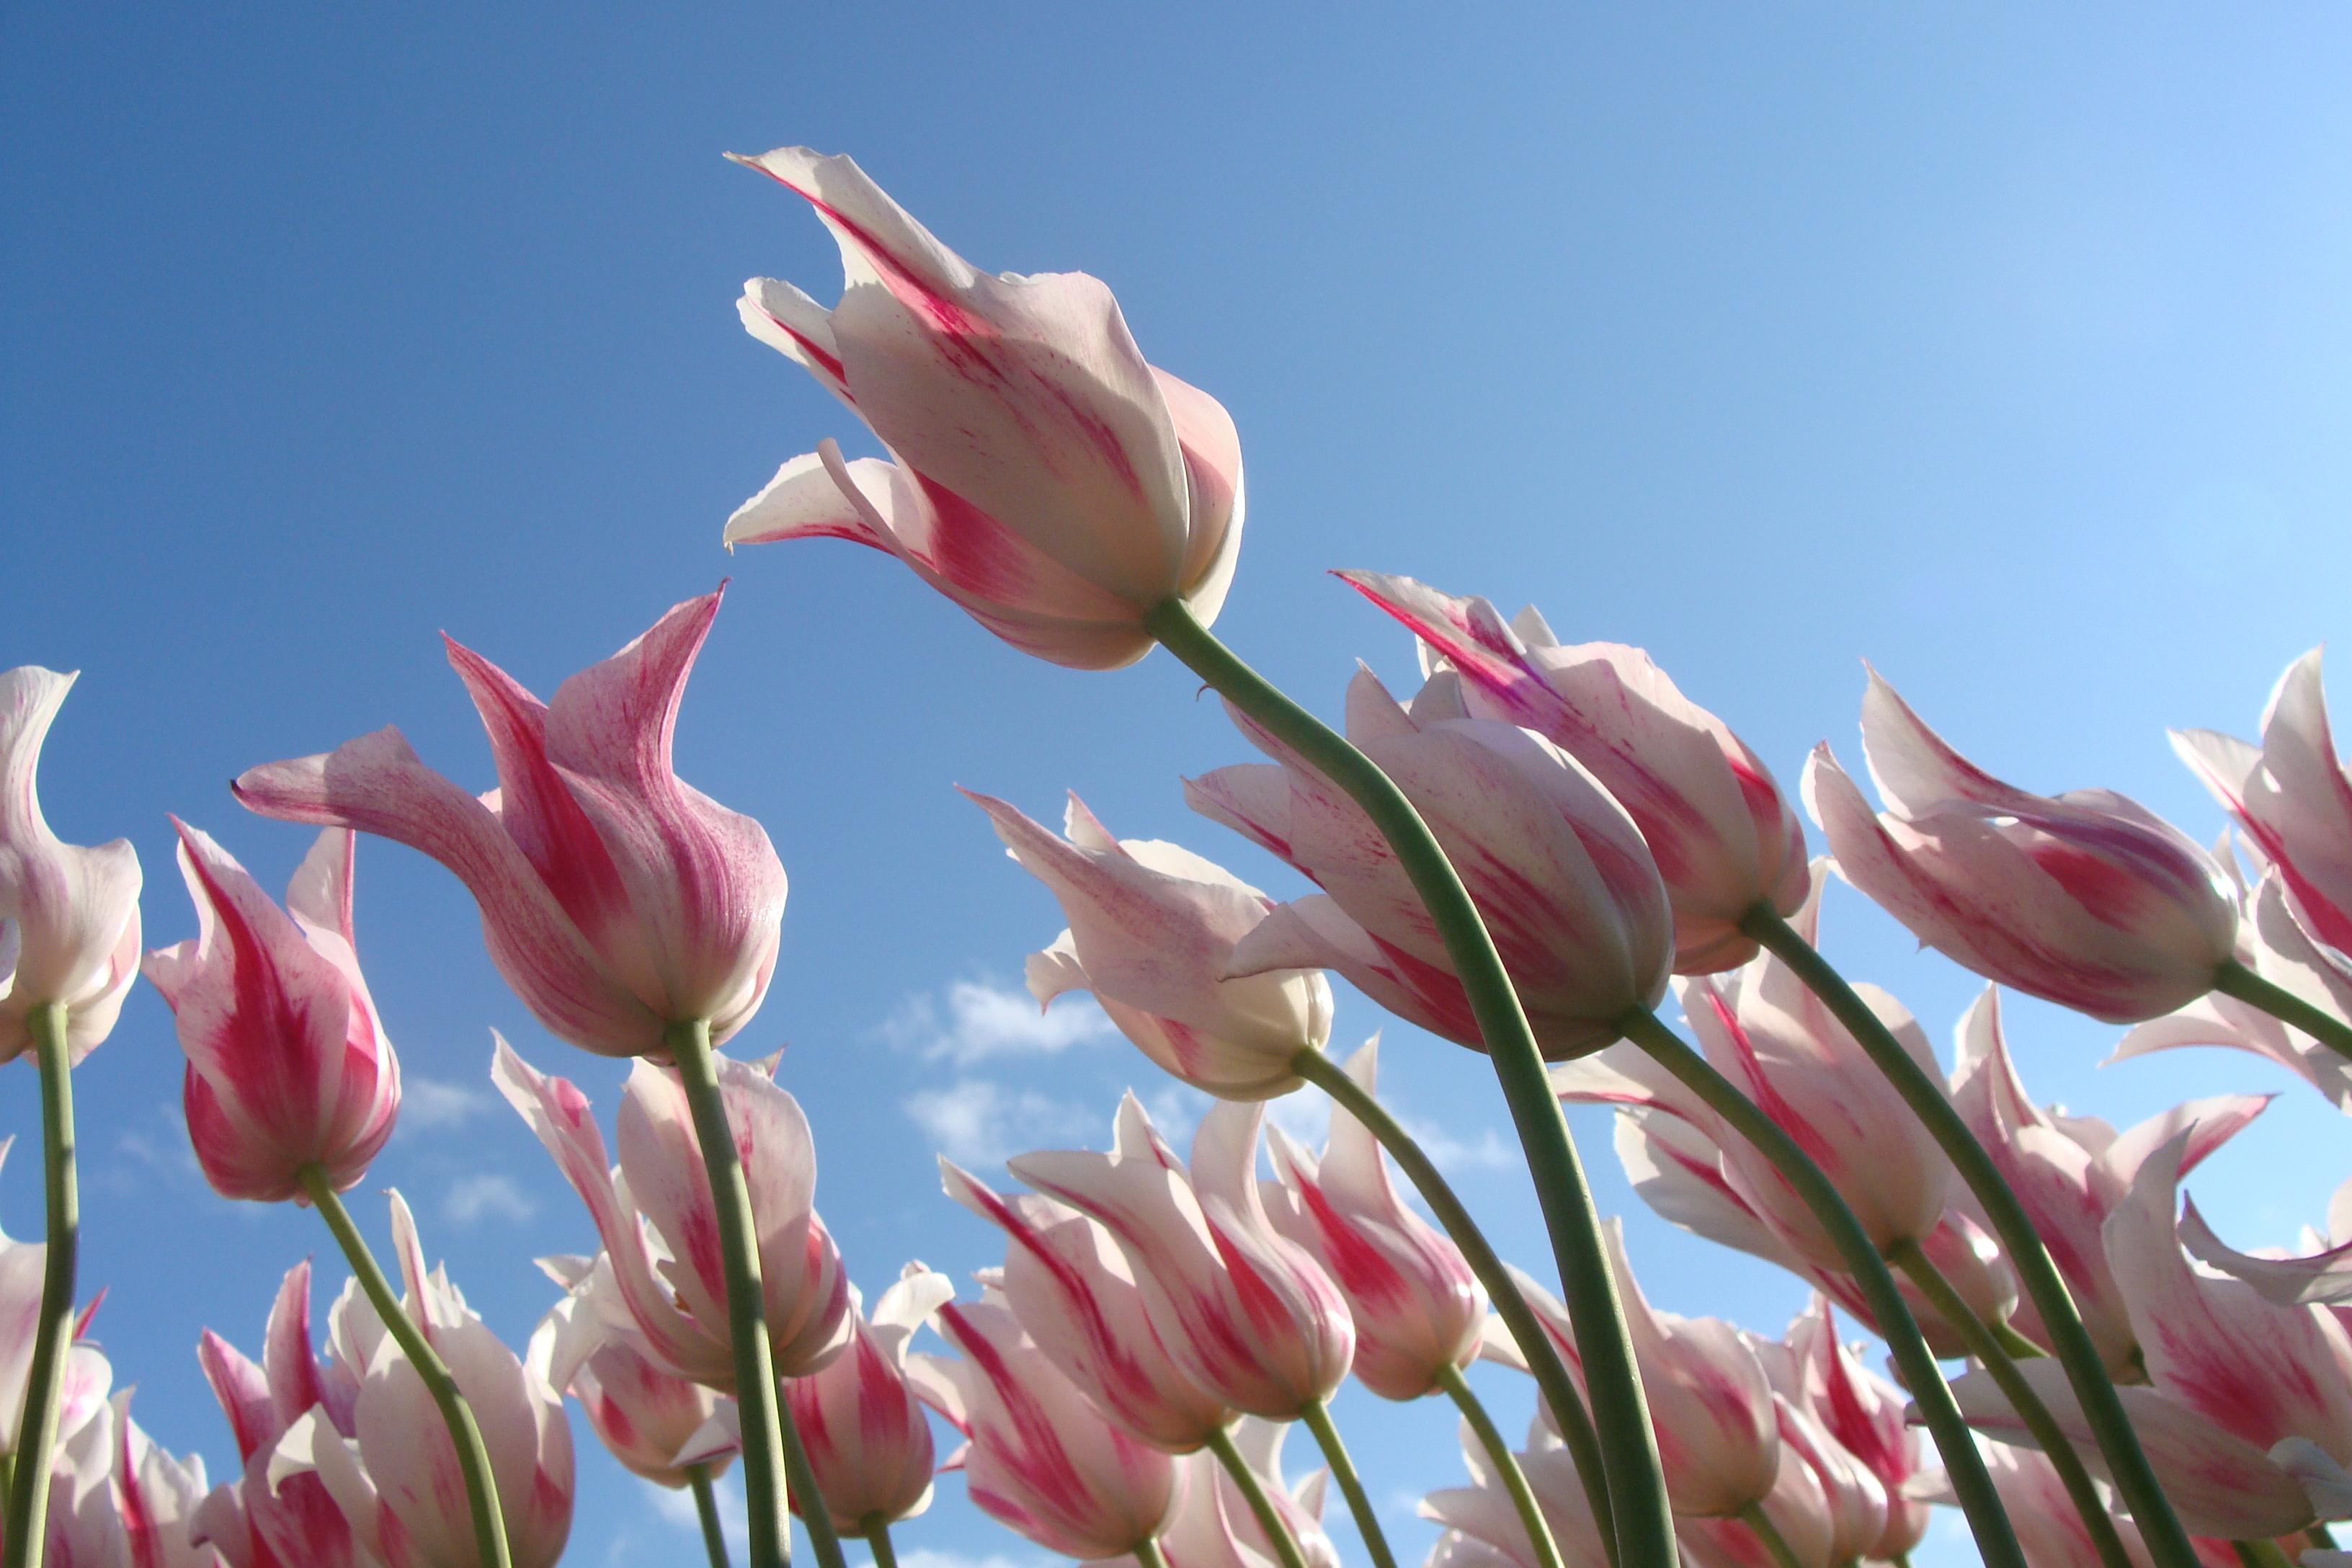 Free Images Blossom Sky Flower Petal Tulip Spring Botany